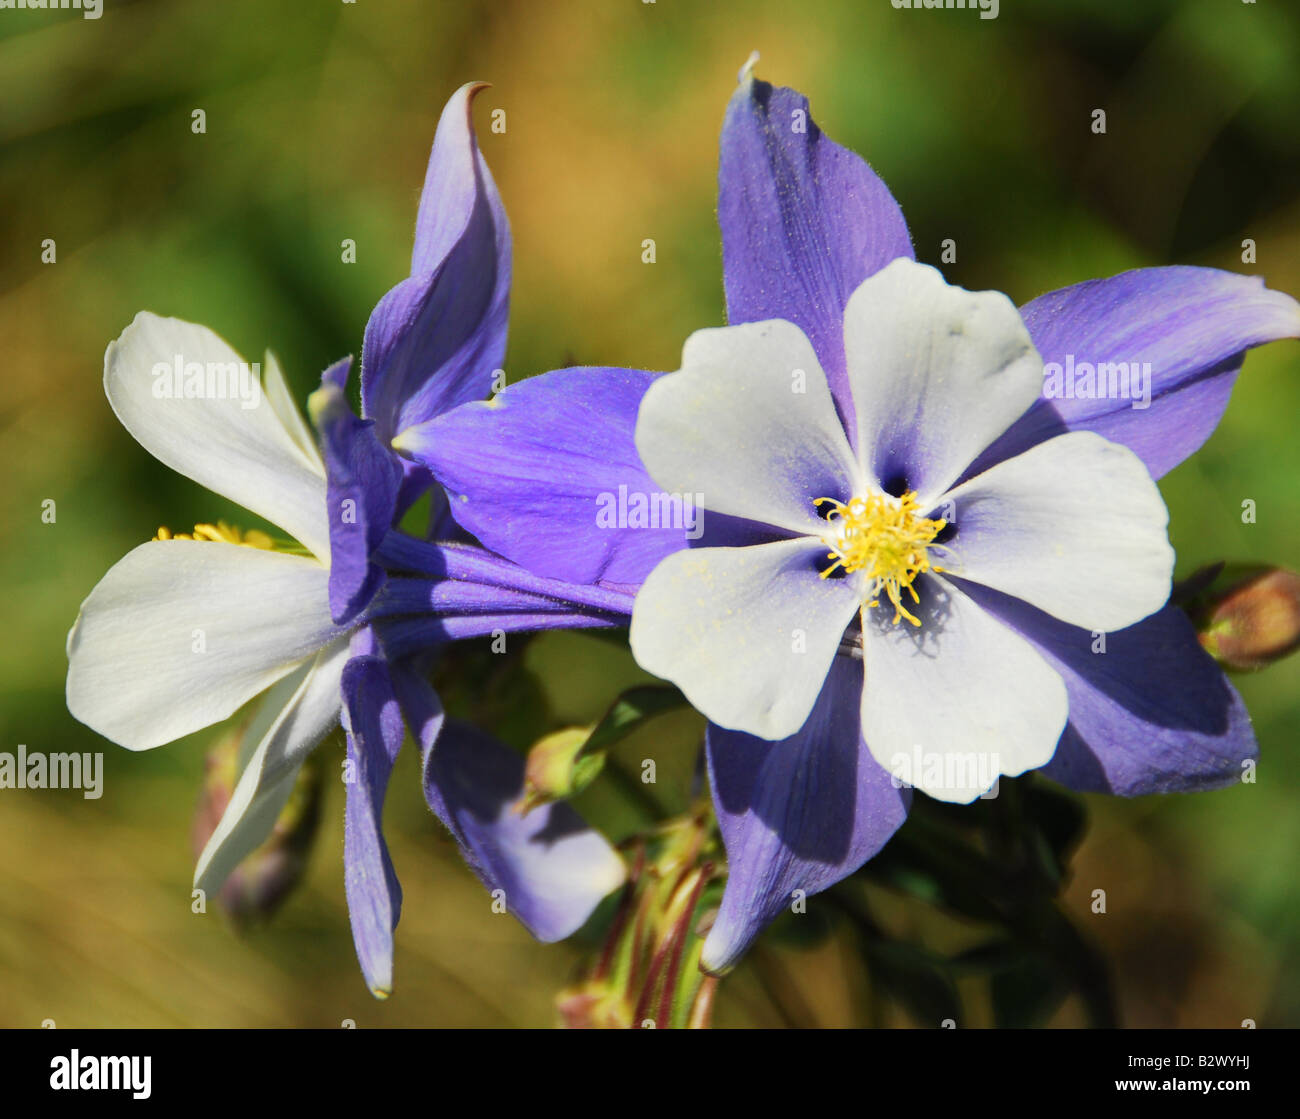 Colorado state flower stock photos colorado state flower stock columbine flowers stock image izmirmasajfo